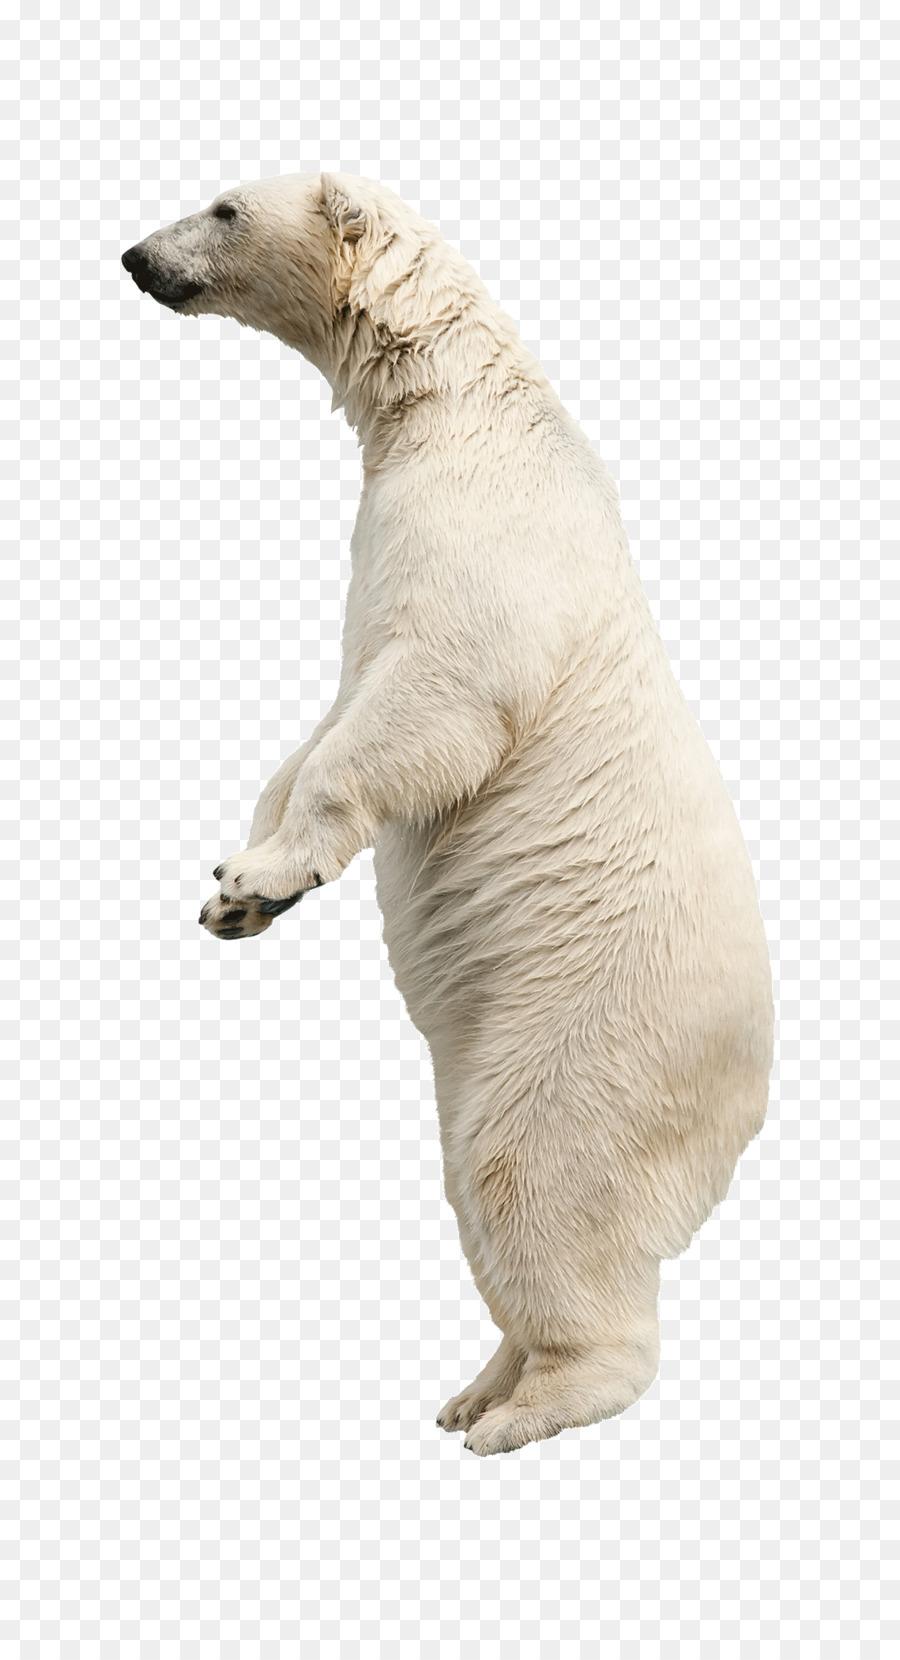 Polar stock photography clip. Bears clipart american black bear